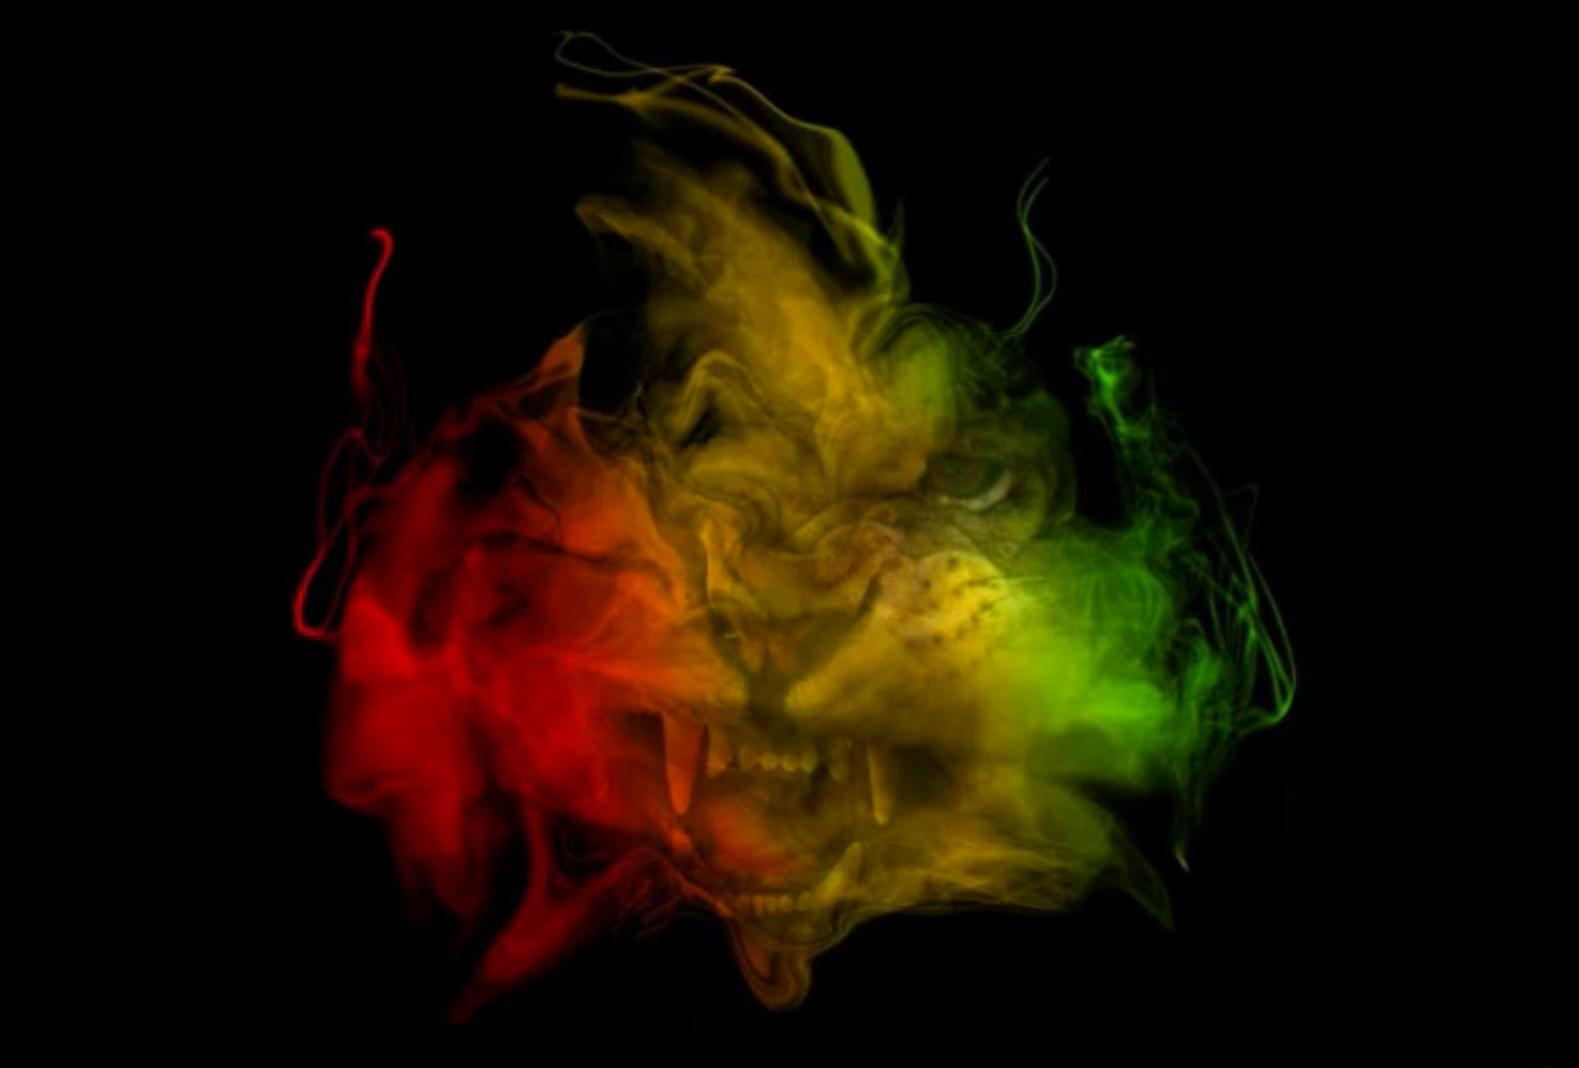 Lion of Judah - Flame